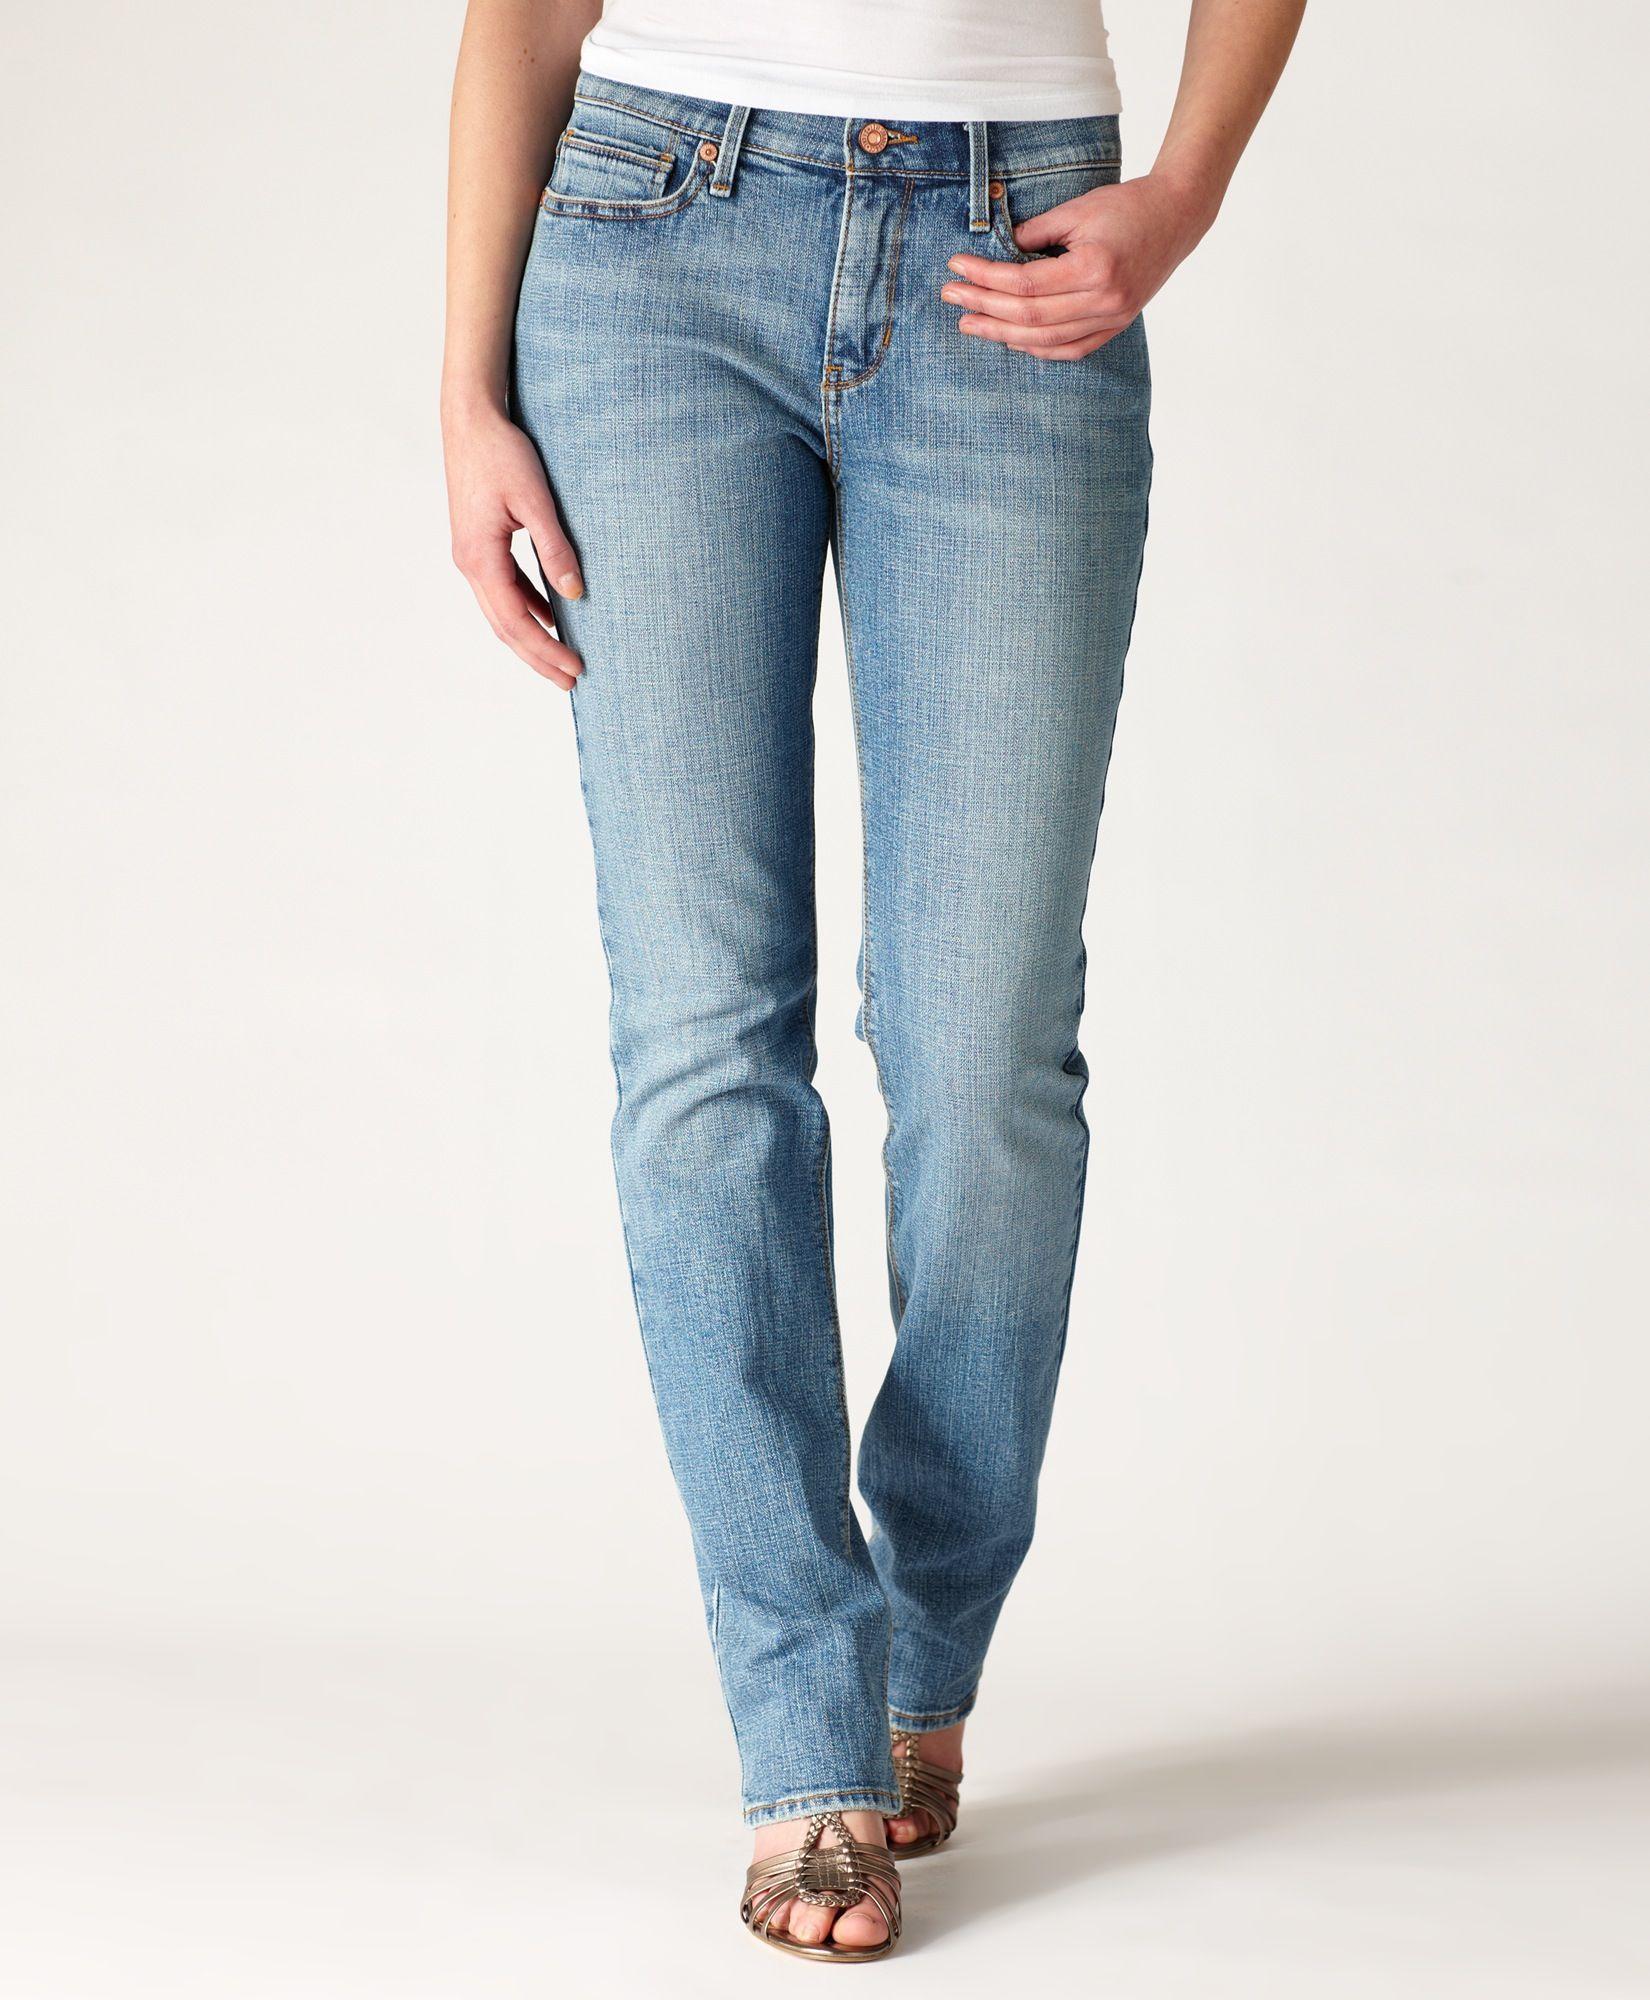 mens best comforter jeans men slim fit most for comfortable